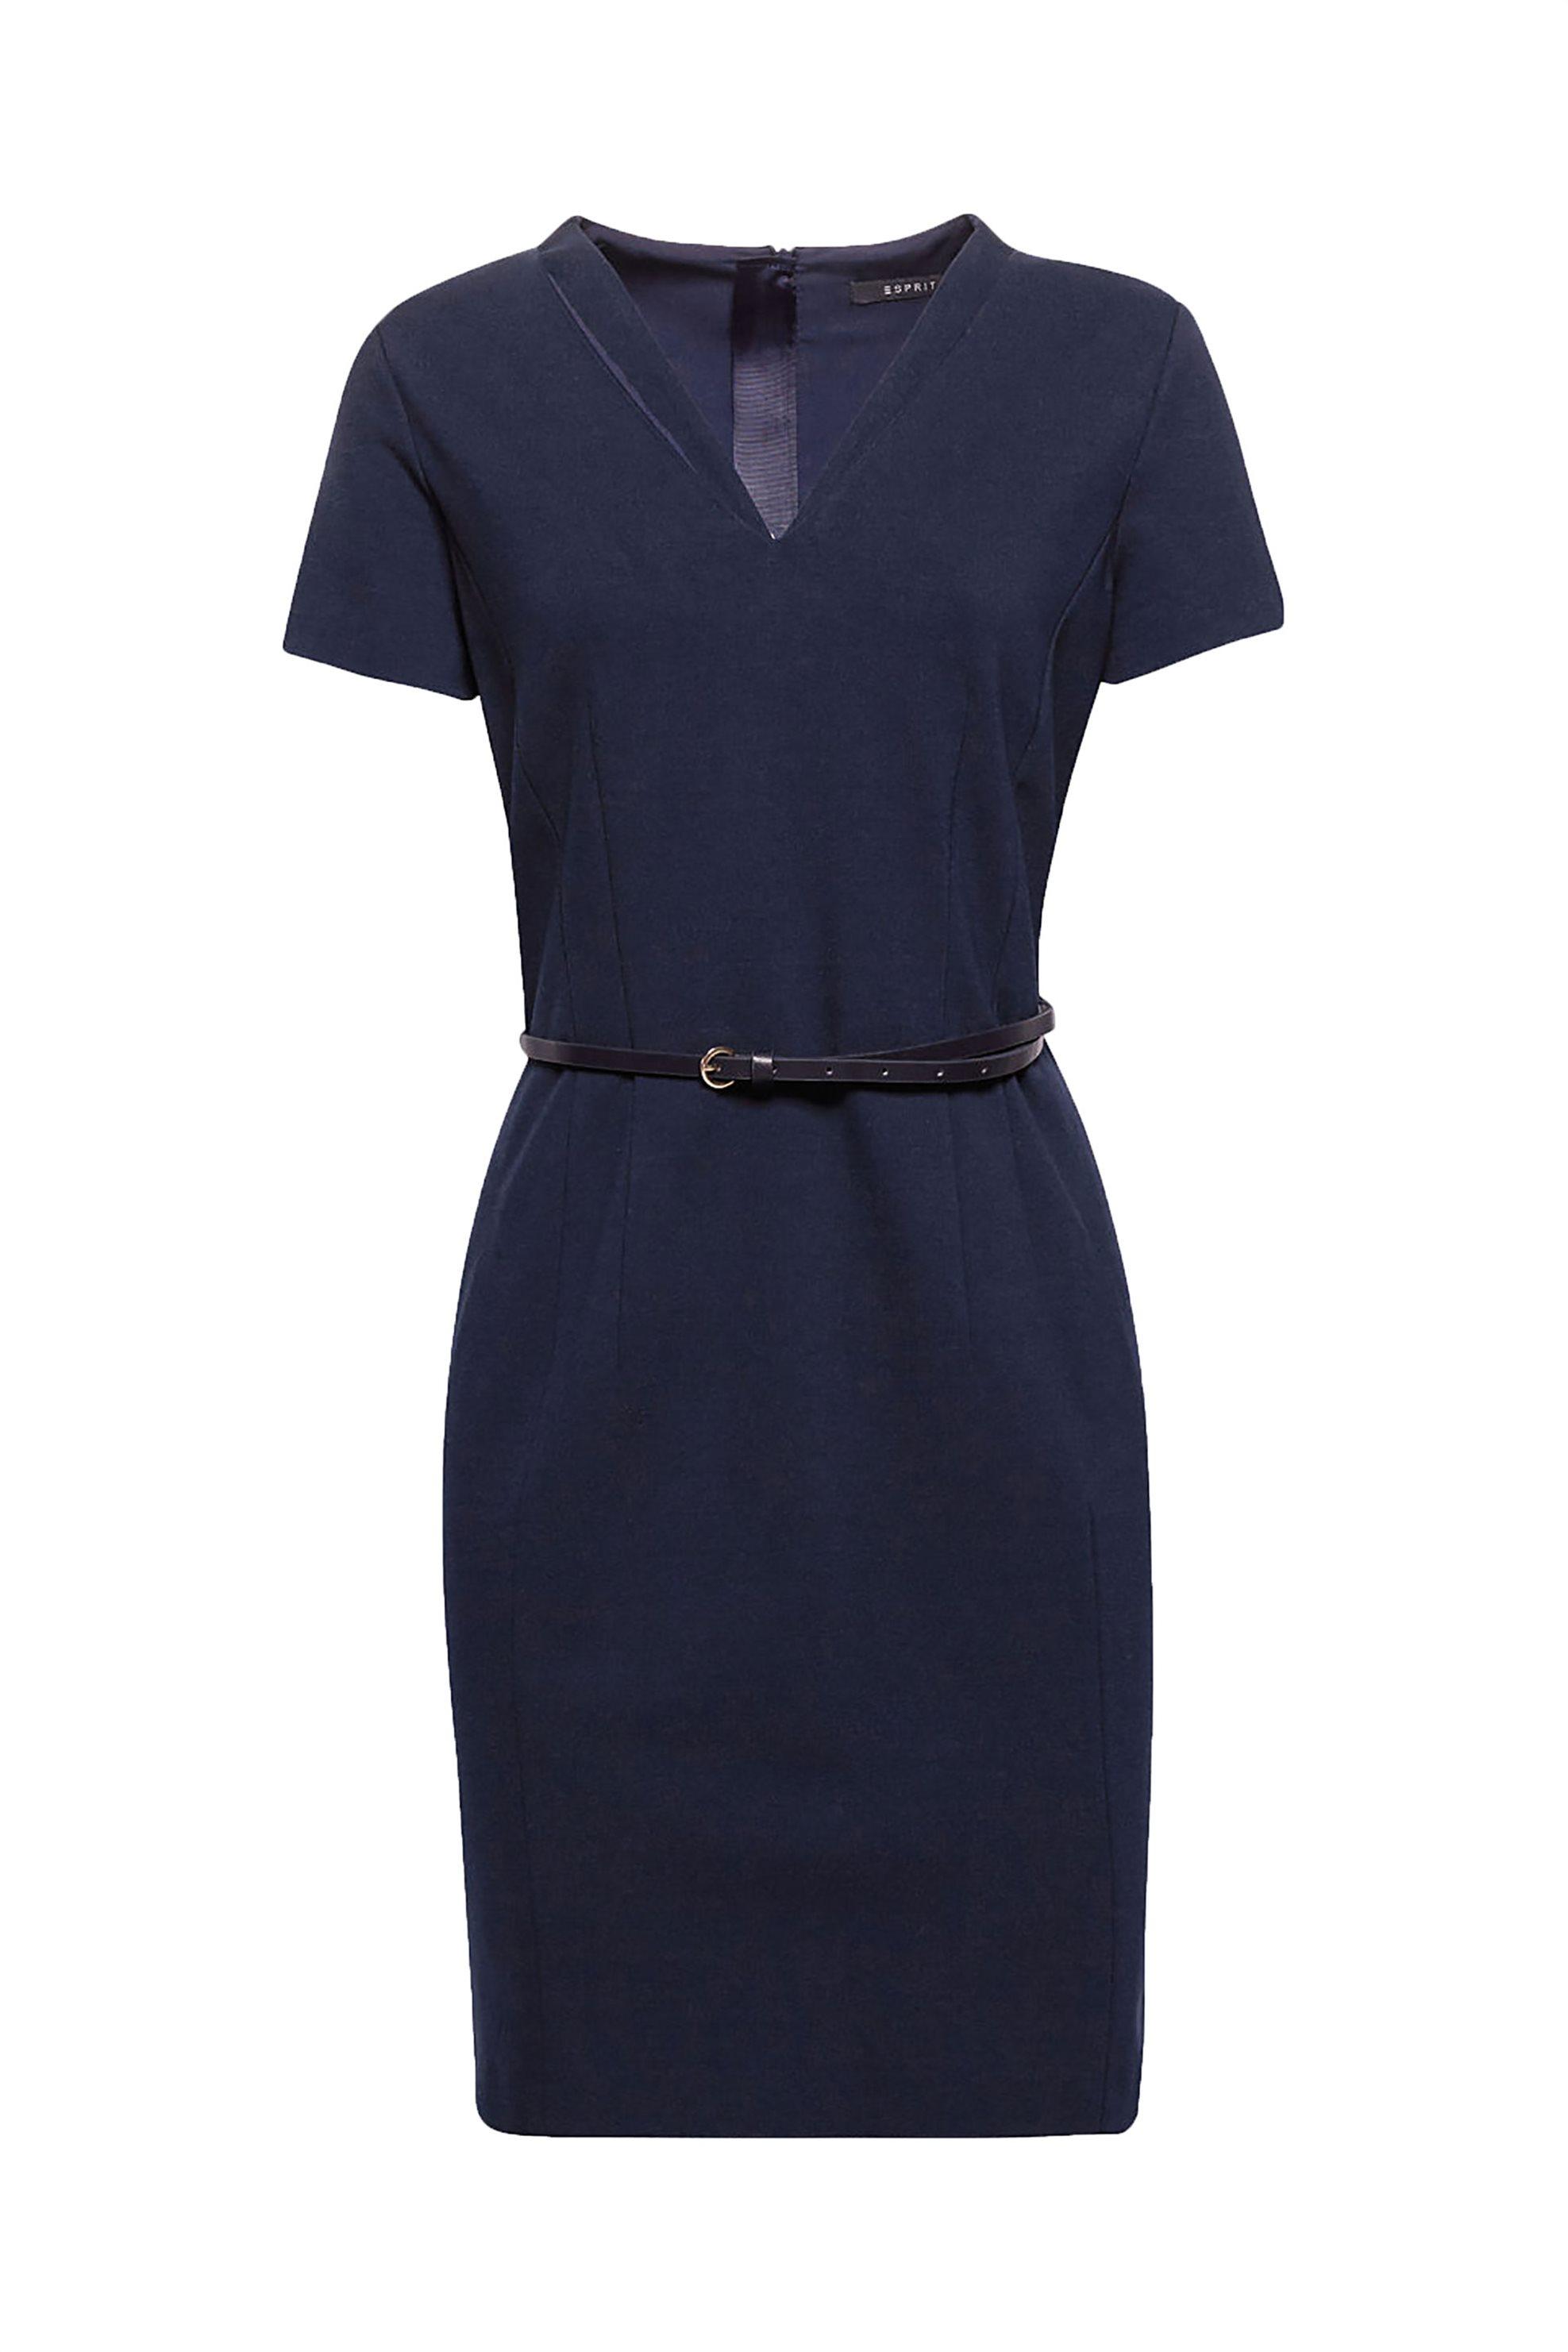 Esprit γυναικείο φόρεμα σε ίσια γραμμή με ζωνάκι - 088EO1E023 - Μπλε Σκούρο γυναικα   ρουχα   φορέματα   mini φορέματα